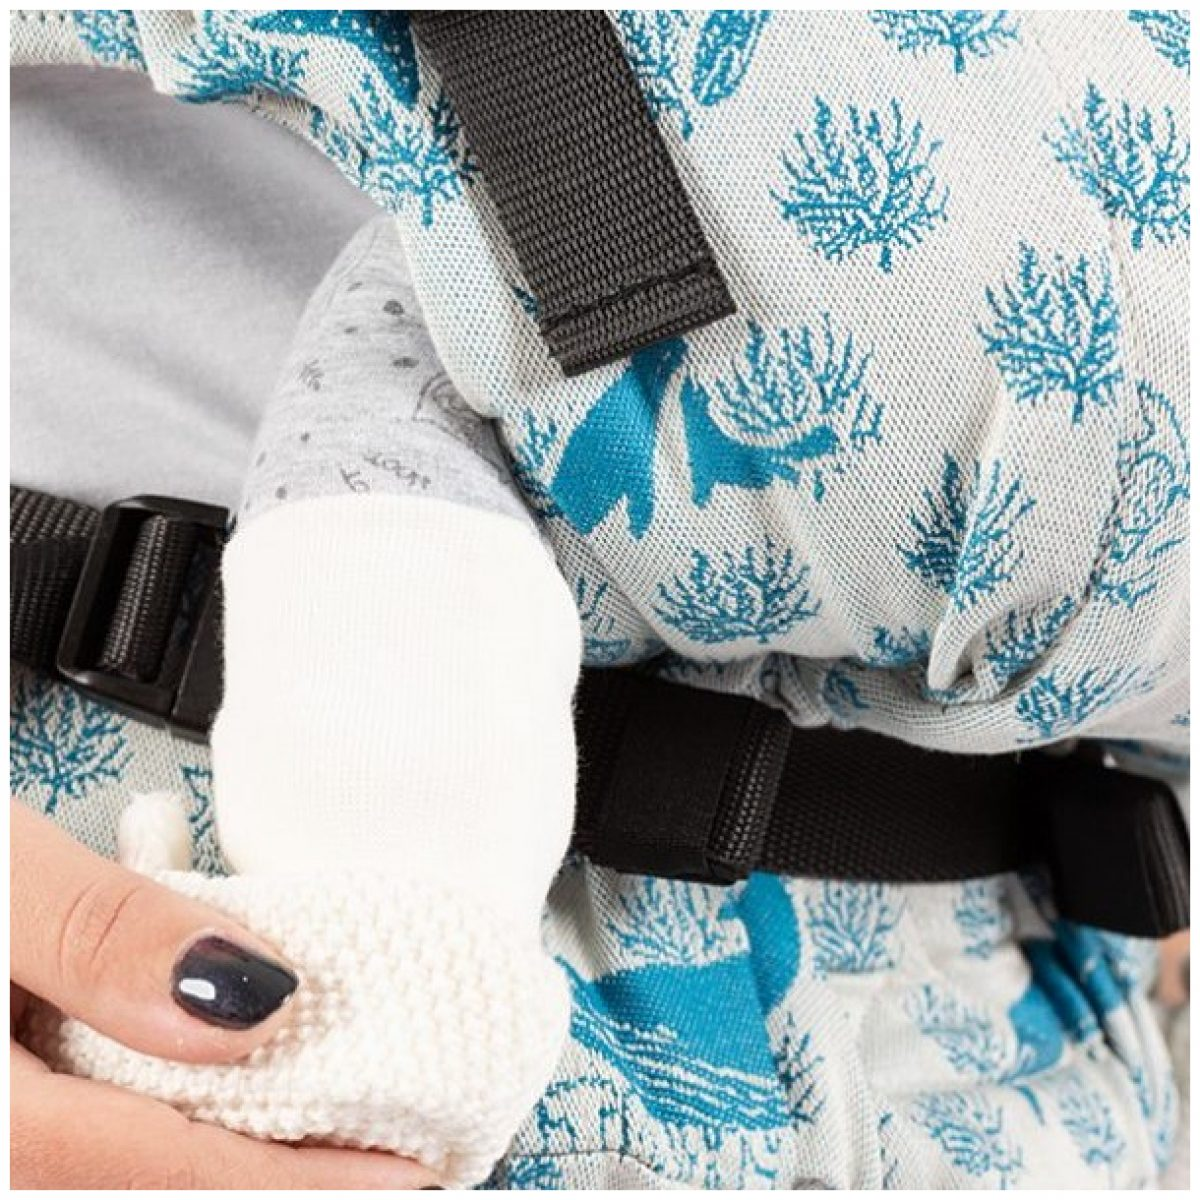 fitting belt